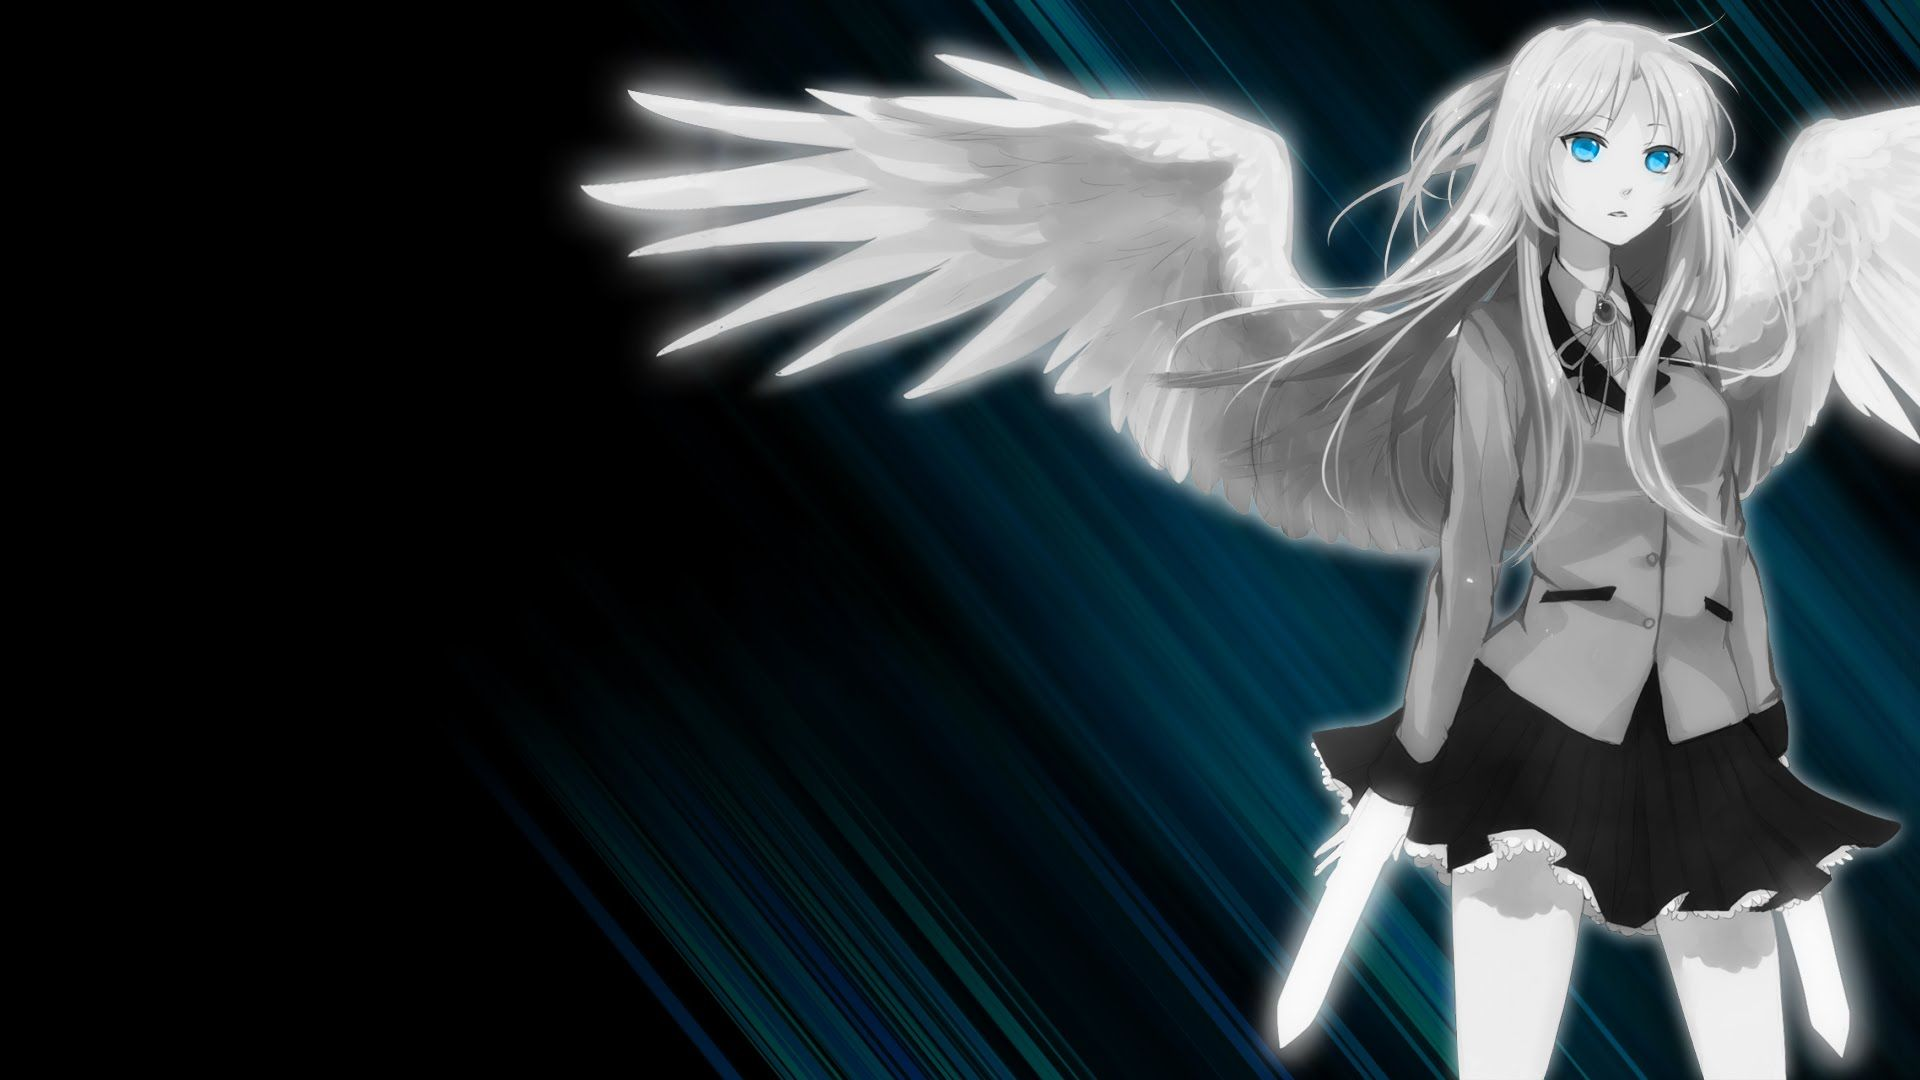 {31} Nightcore (Three Days Grace) Fallen Angel (with